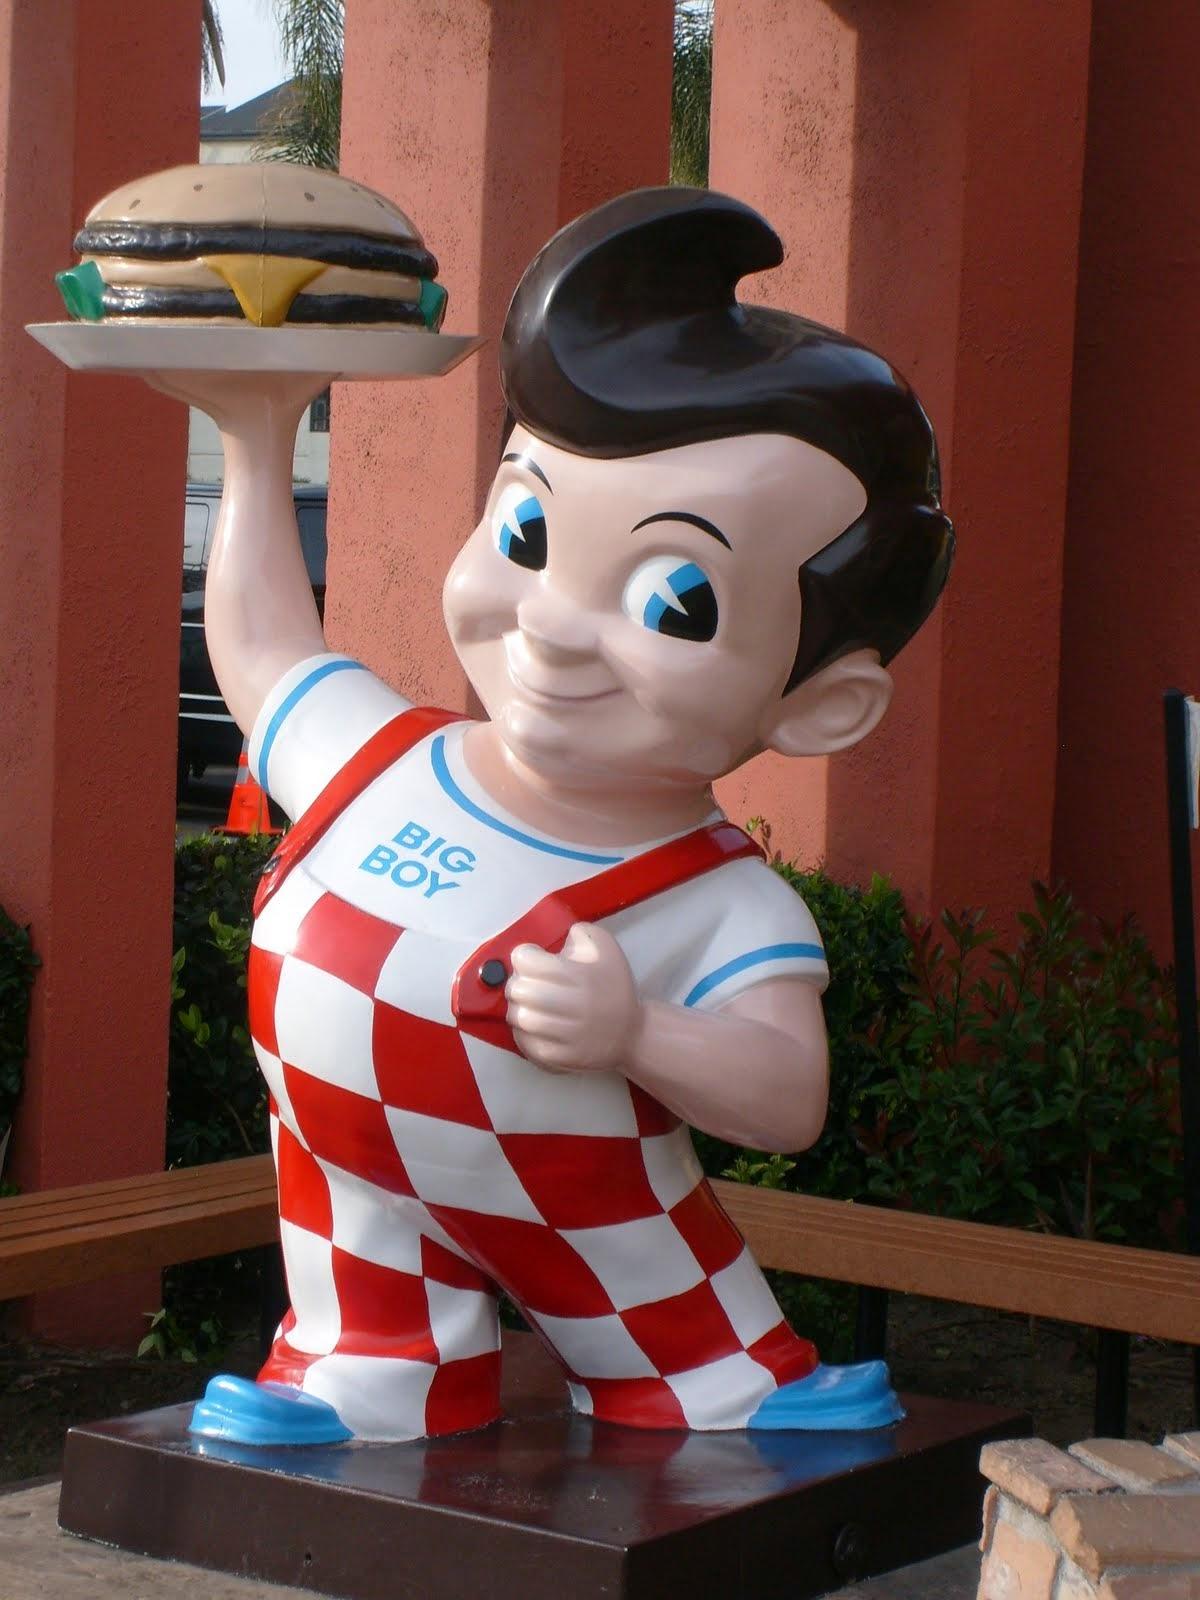 Bob Big Boy Restaurant Toluca Lake